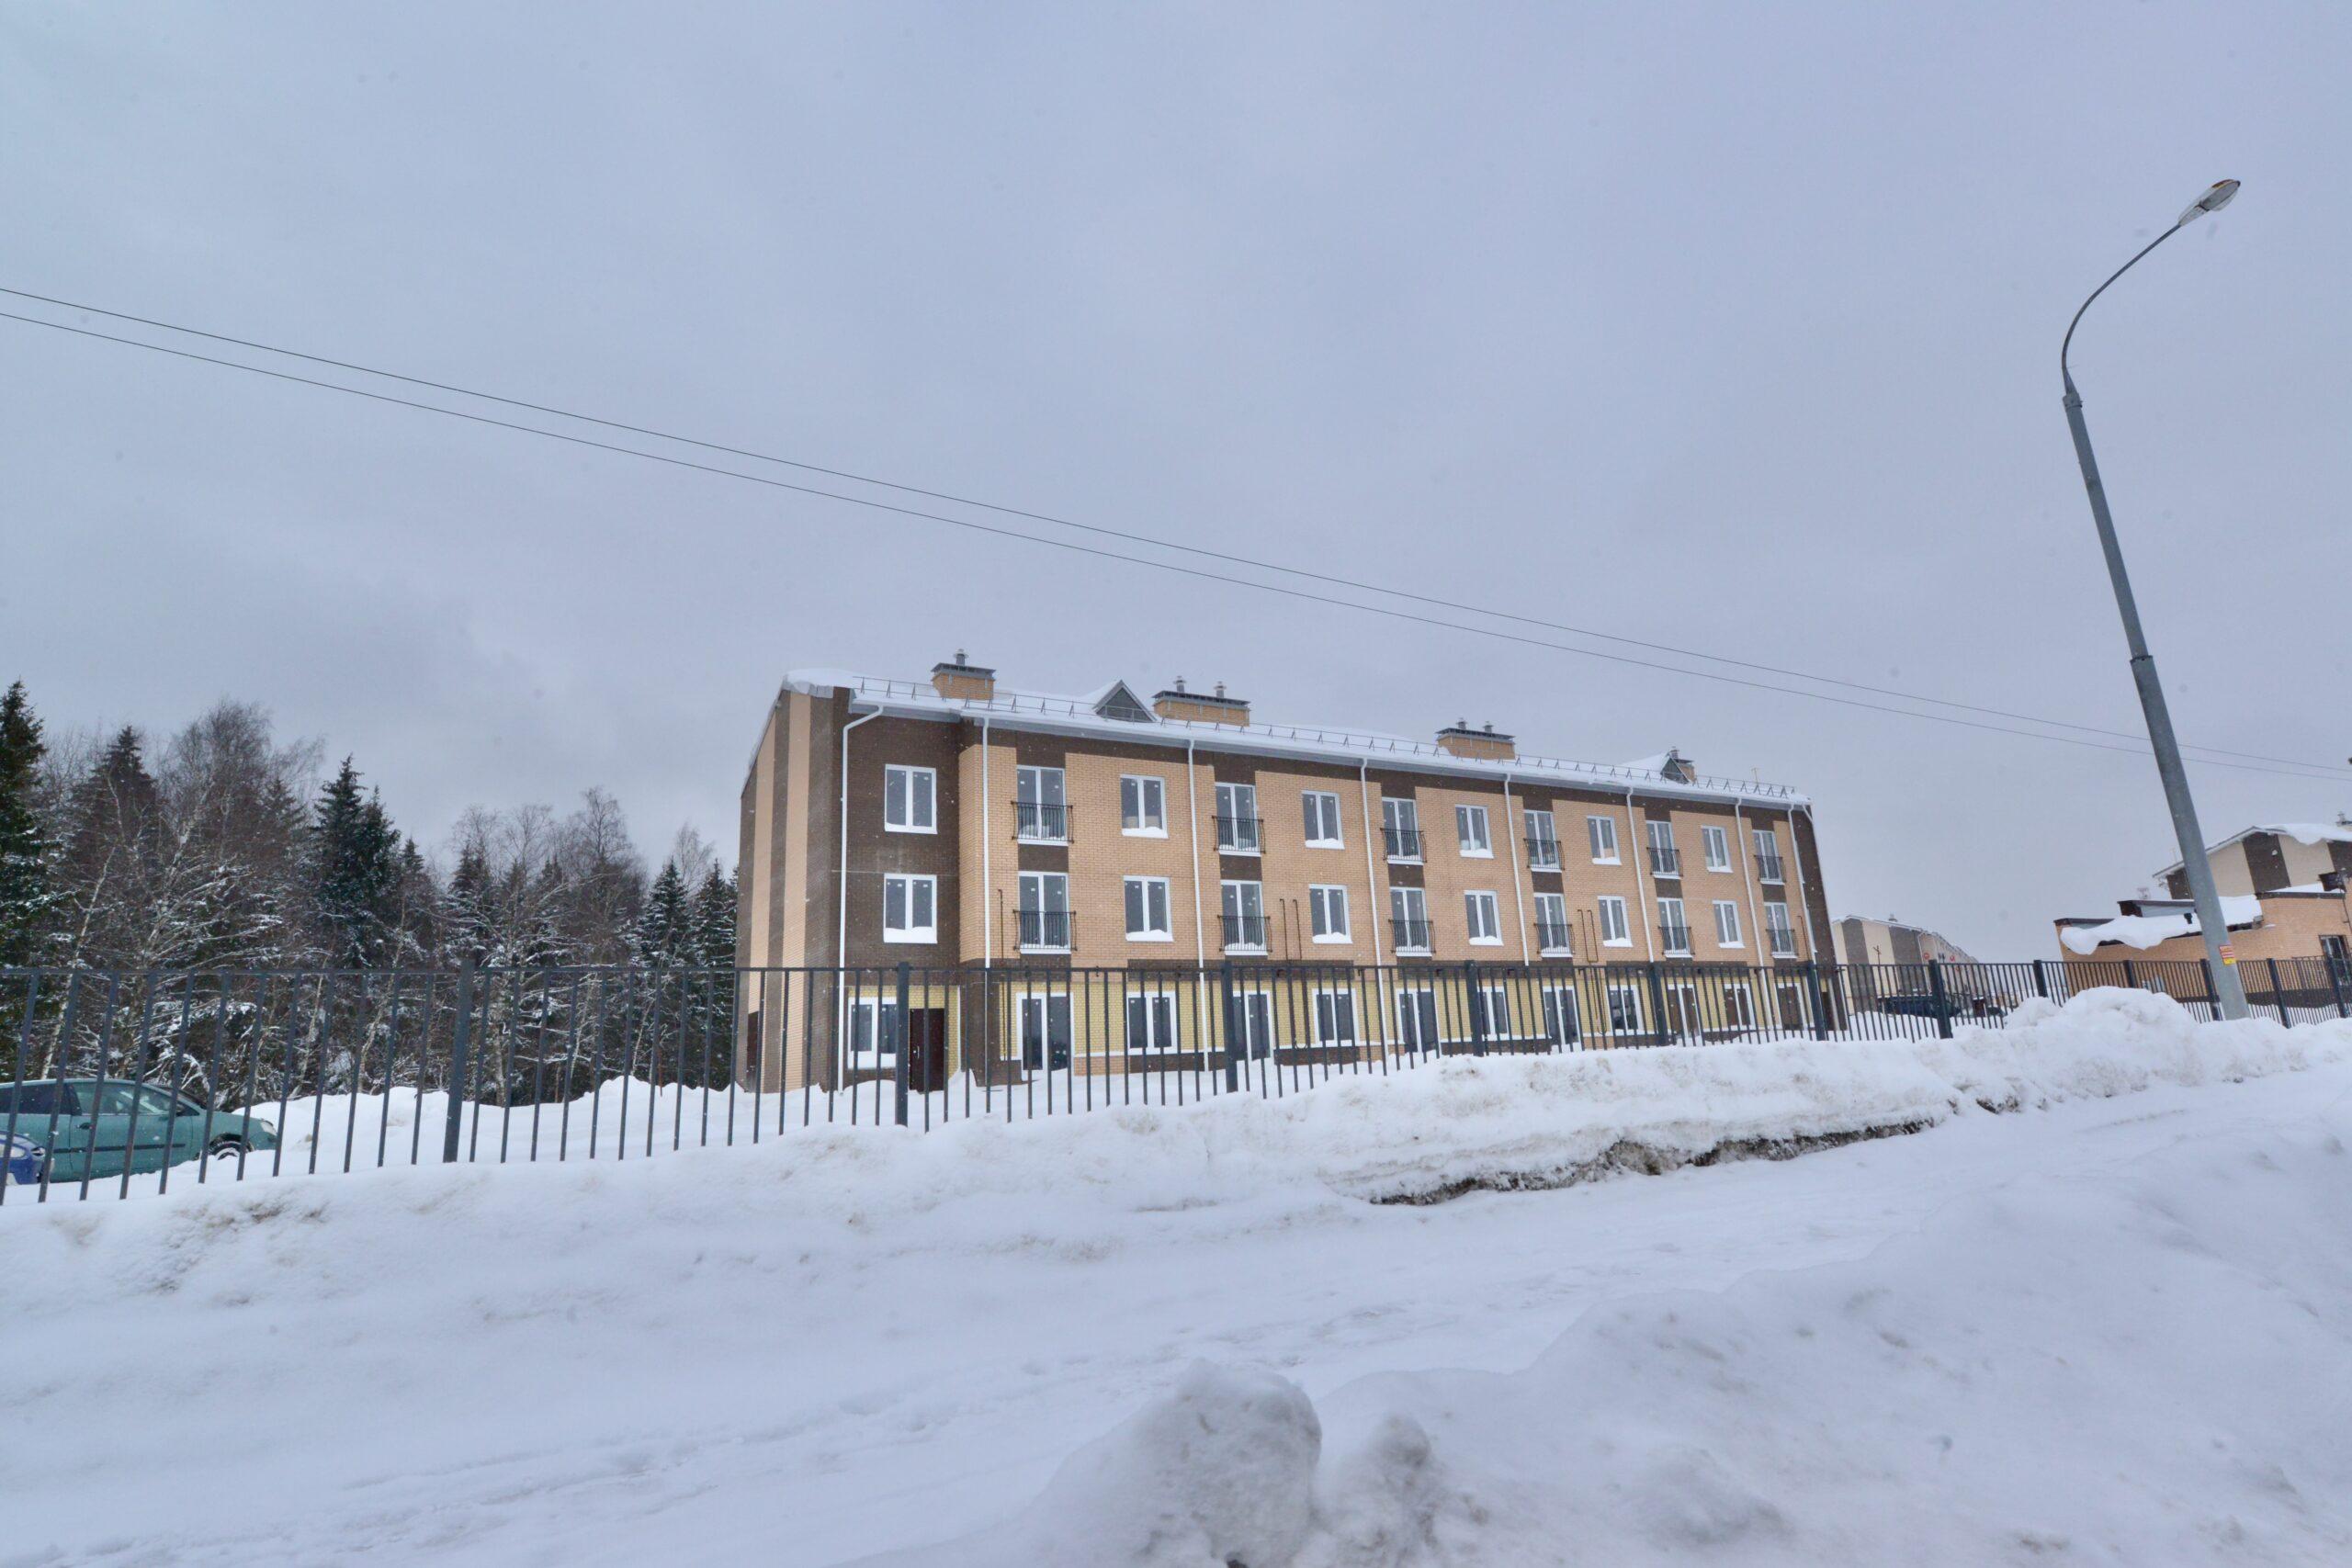 ЖК Борисоглебское. Фотофиксация от 01.03.2021